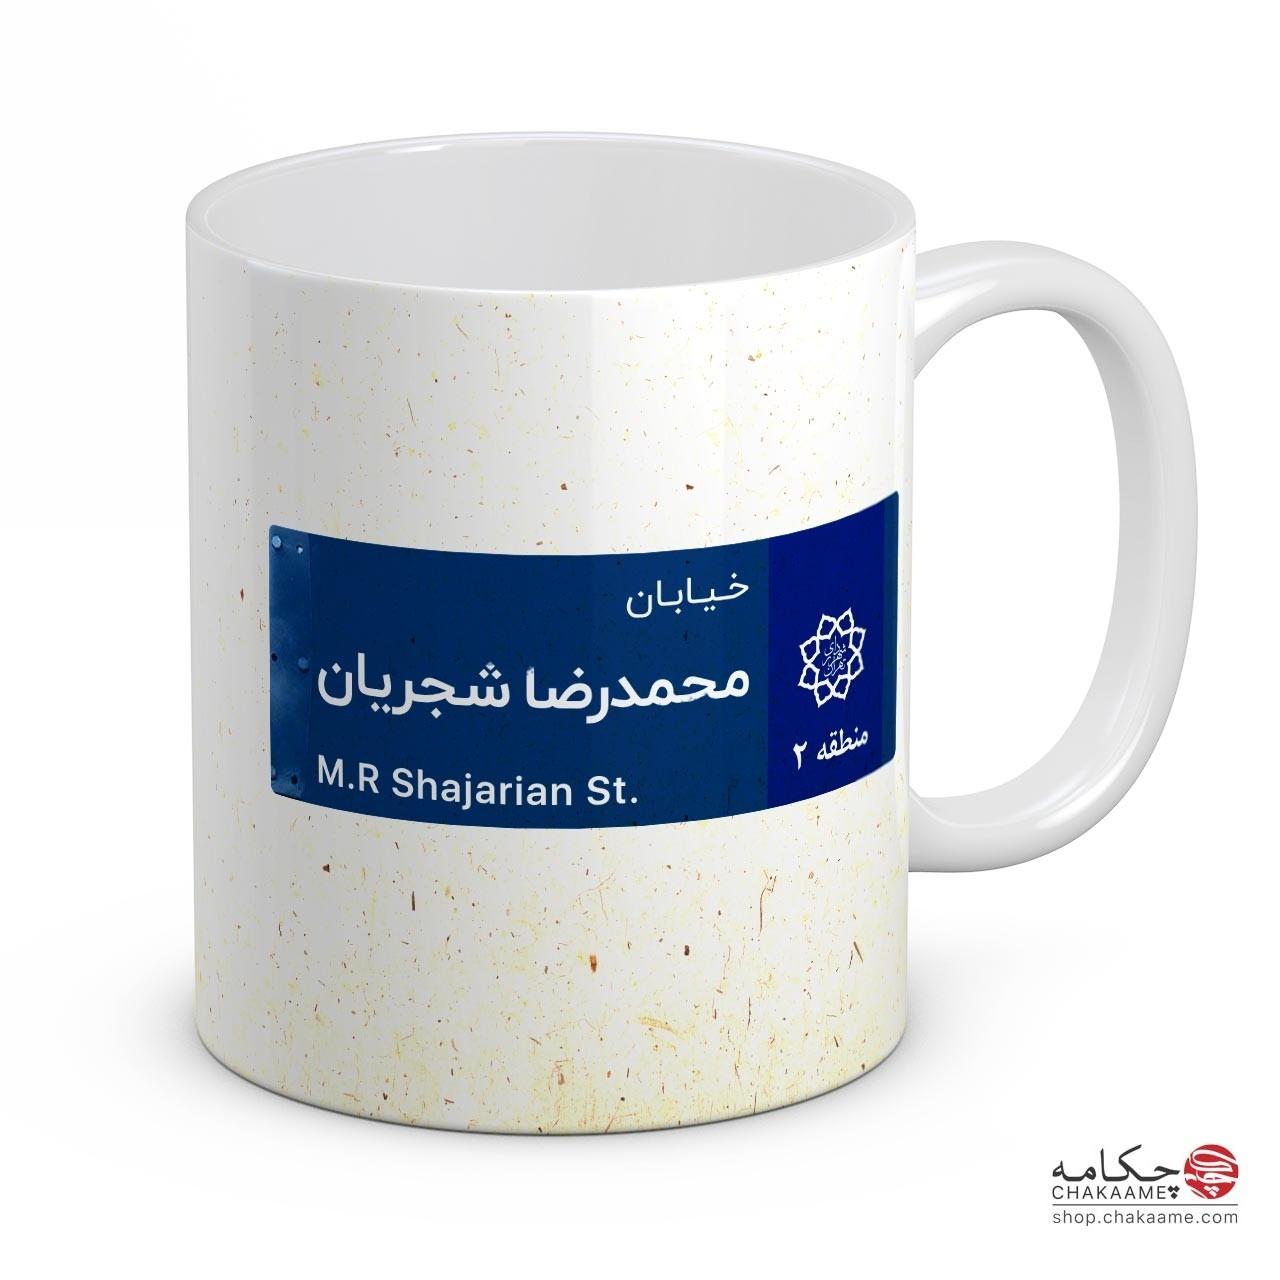 خیابان محمدرضا شجریان - لیوان چکامه